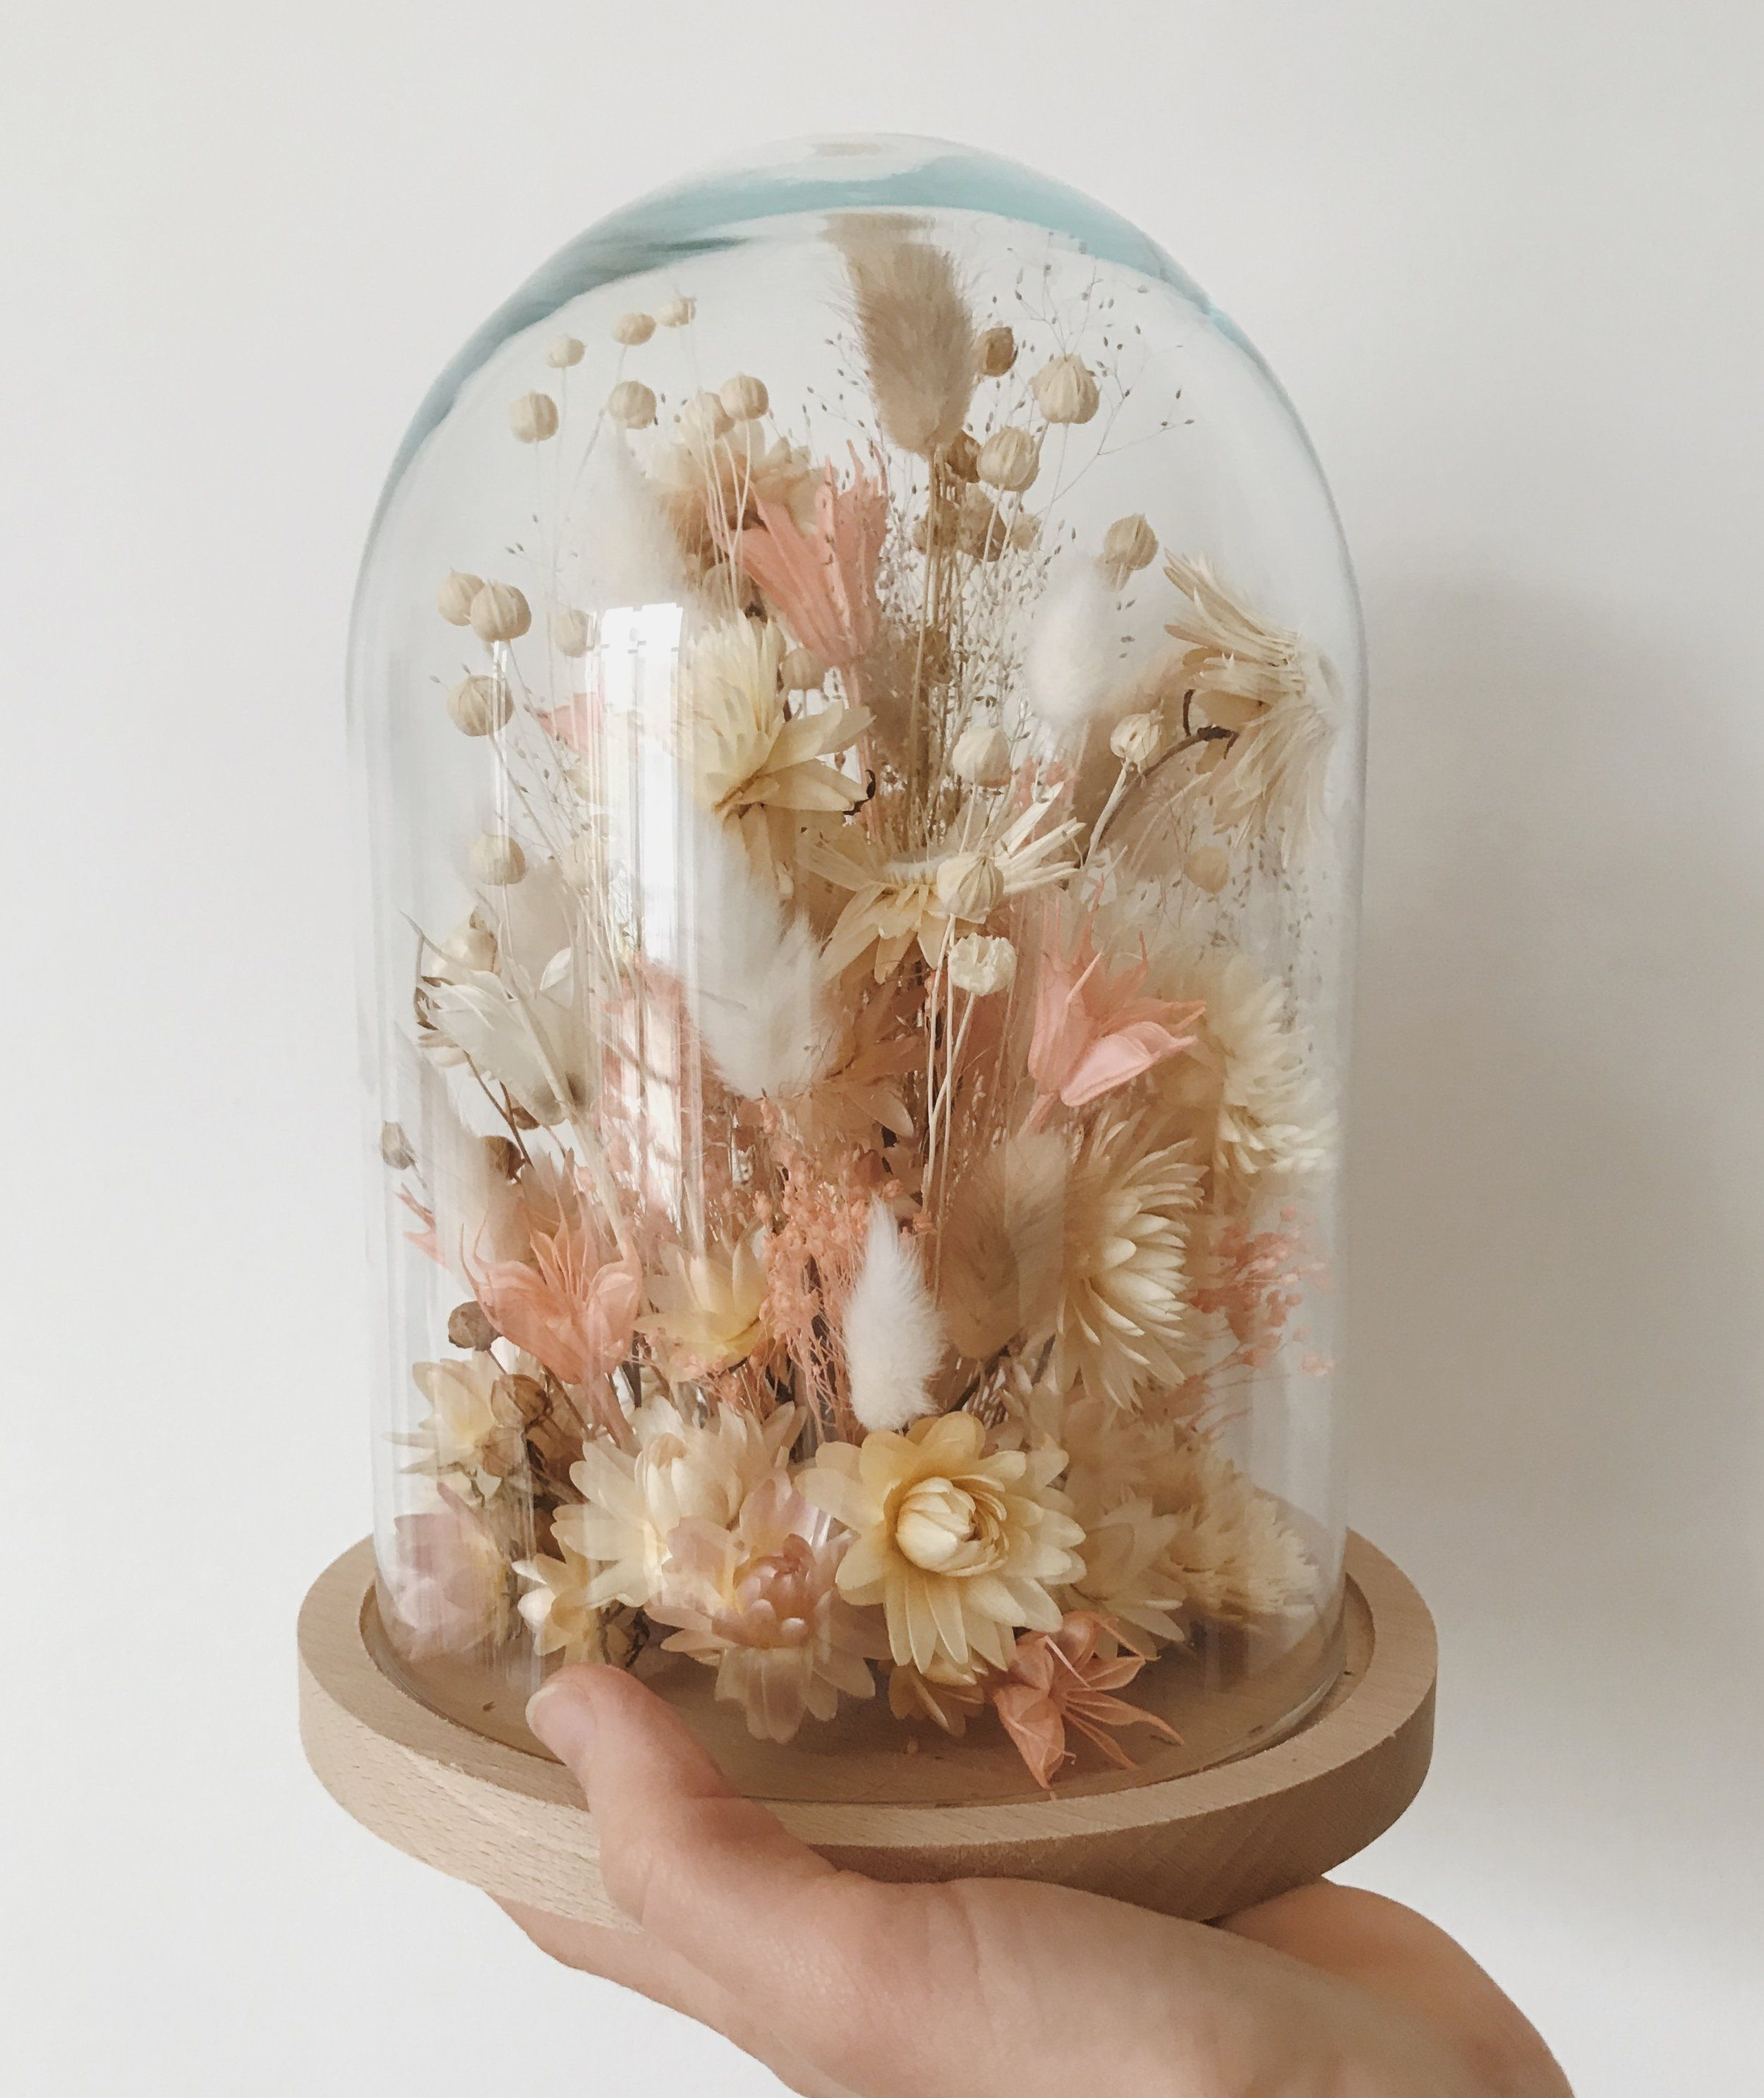 10 Creative Ways to Preserve Your Wedding Flowers